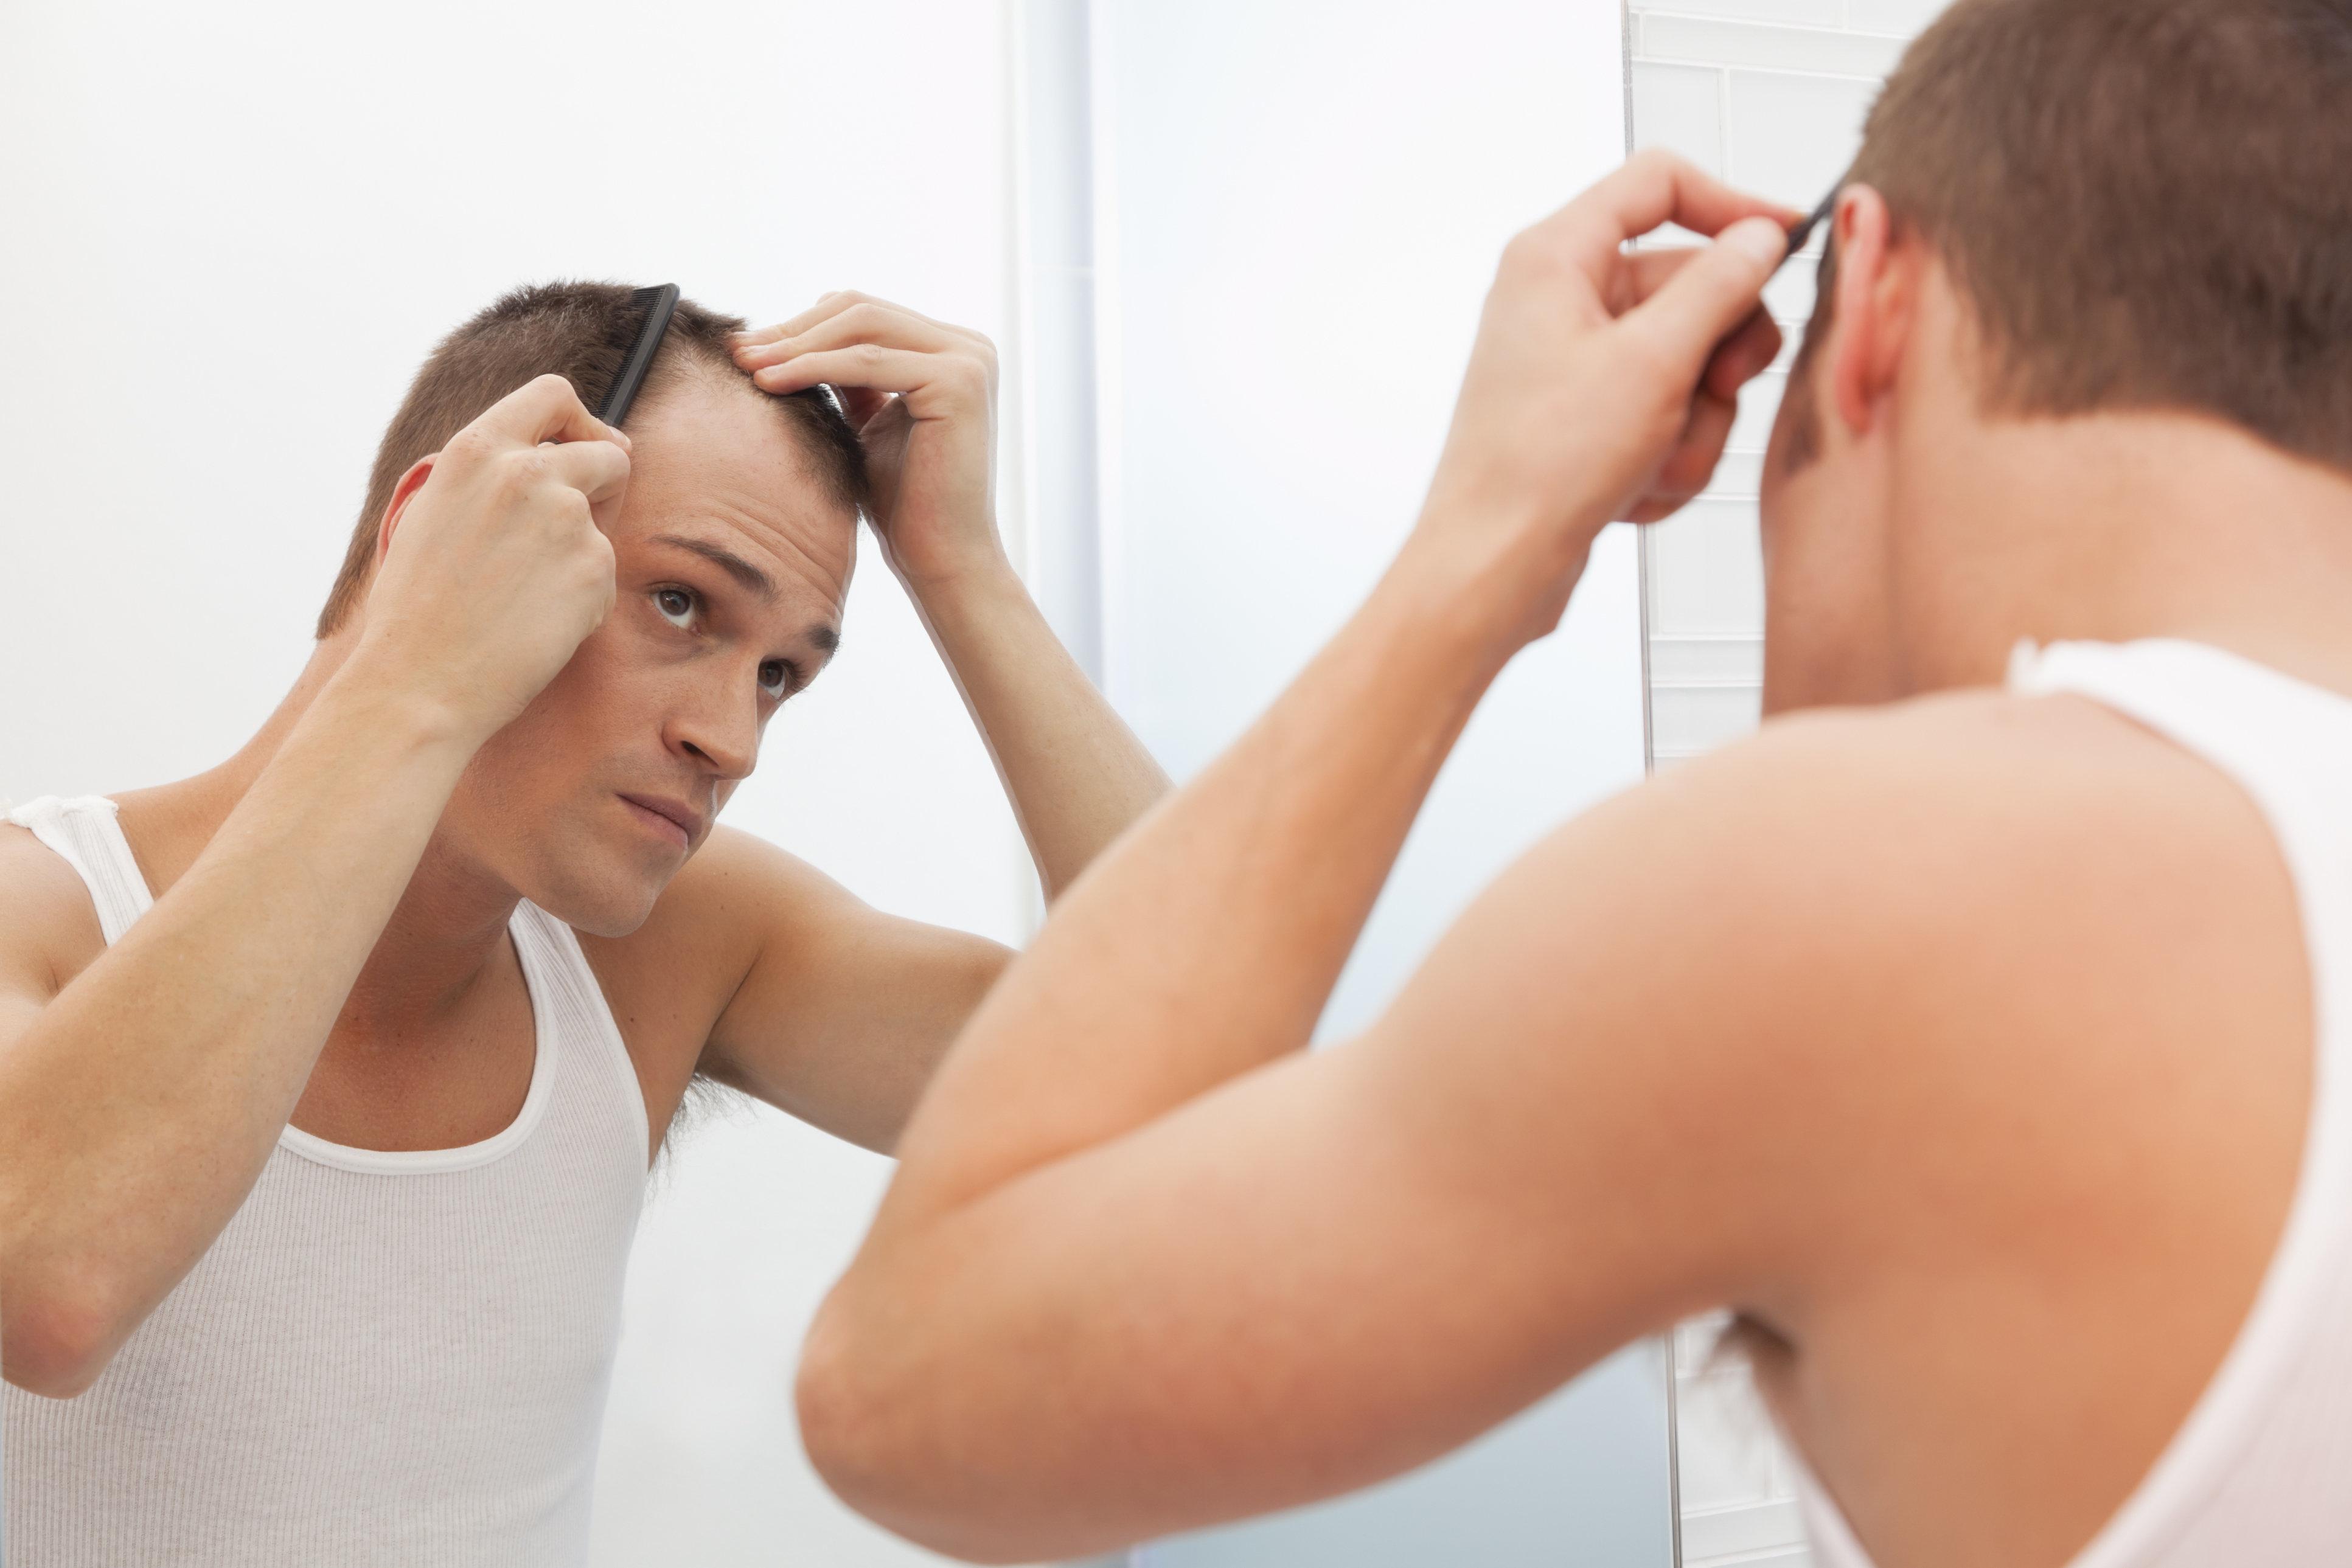 USA, Illinois, Metamora, Man combing hair in front of mirror